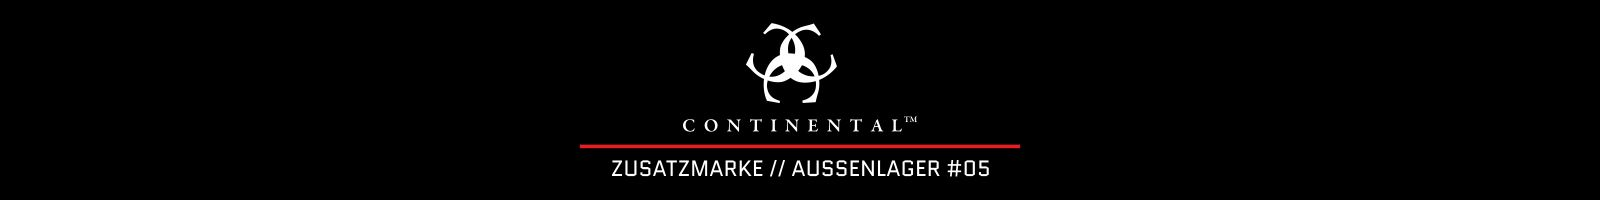 Kategorie-Marken => Continental Clothing